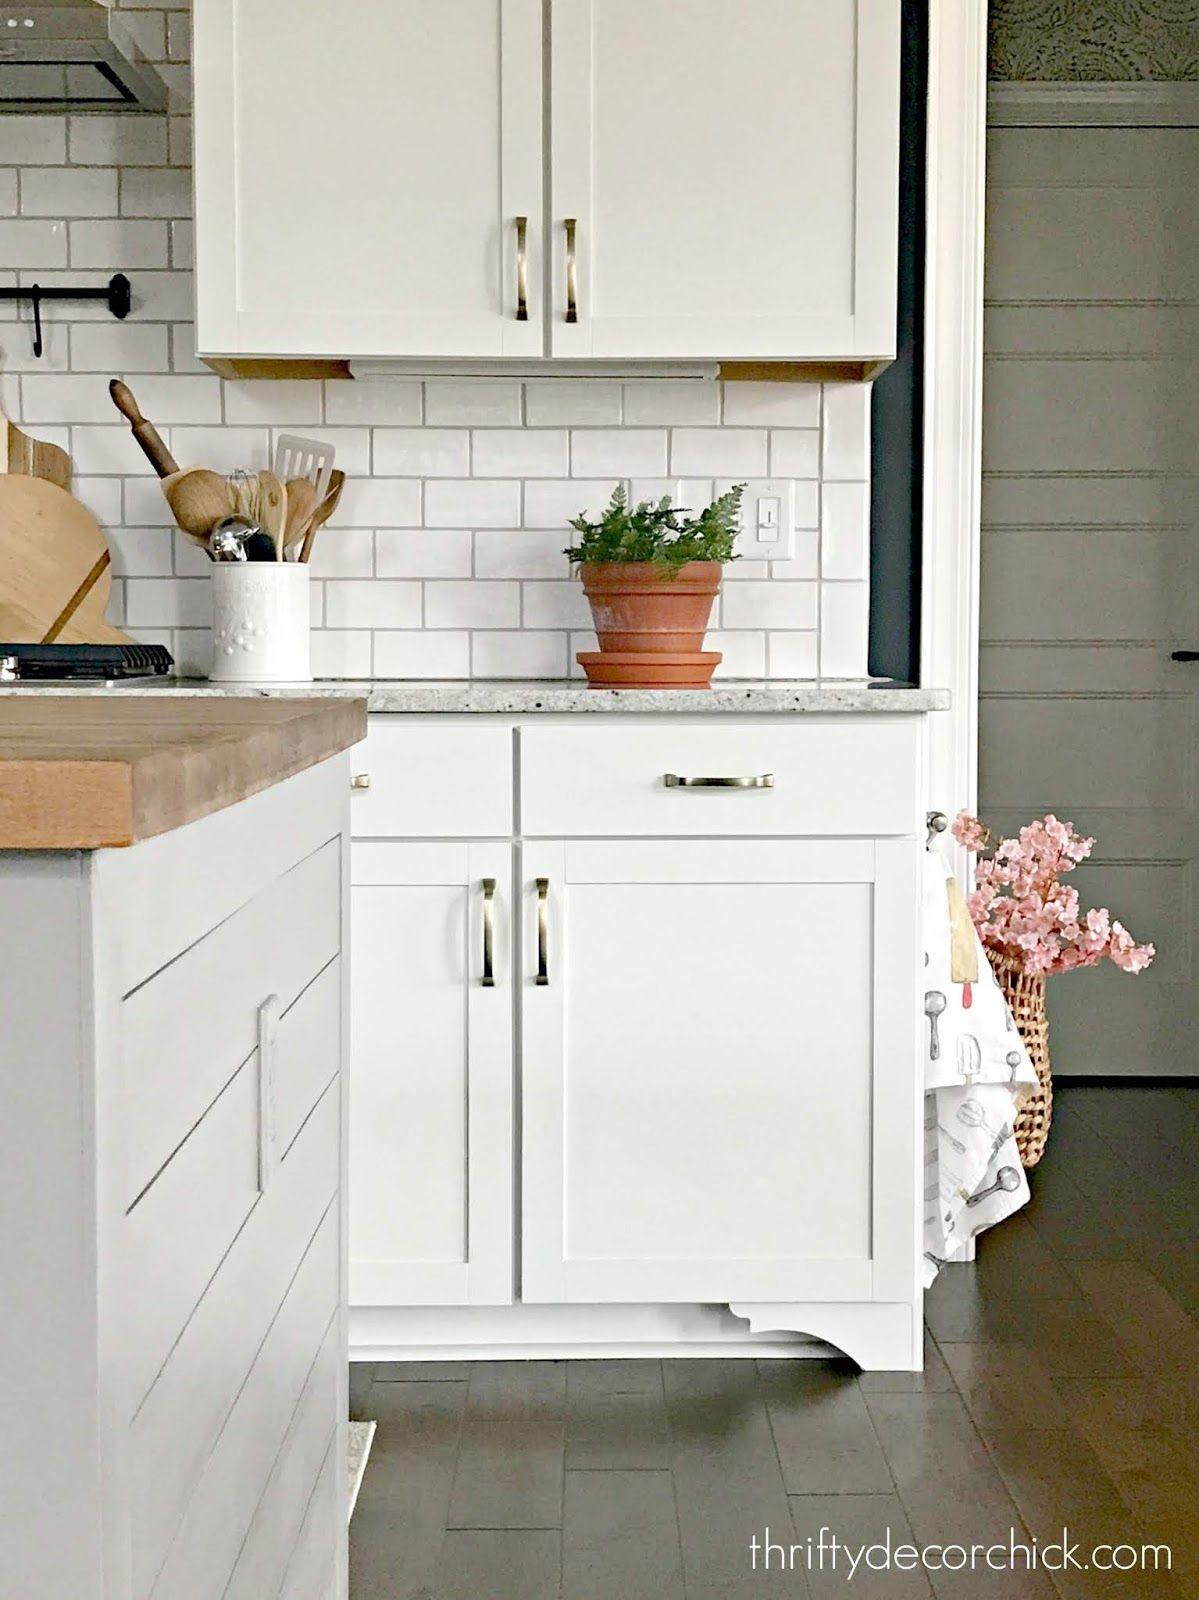 Diy Furniture Feet For Basic Kitchen Cabinets Kitchen Cabinets Kitchen Cabinet Trends New Kitchen Cabinets